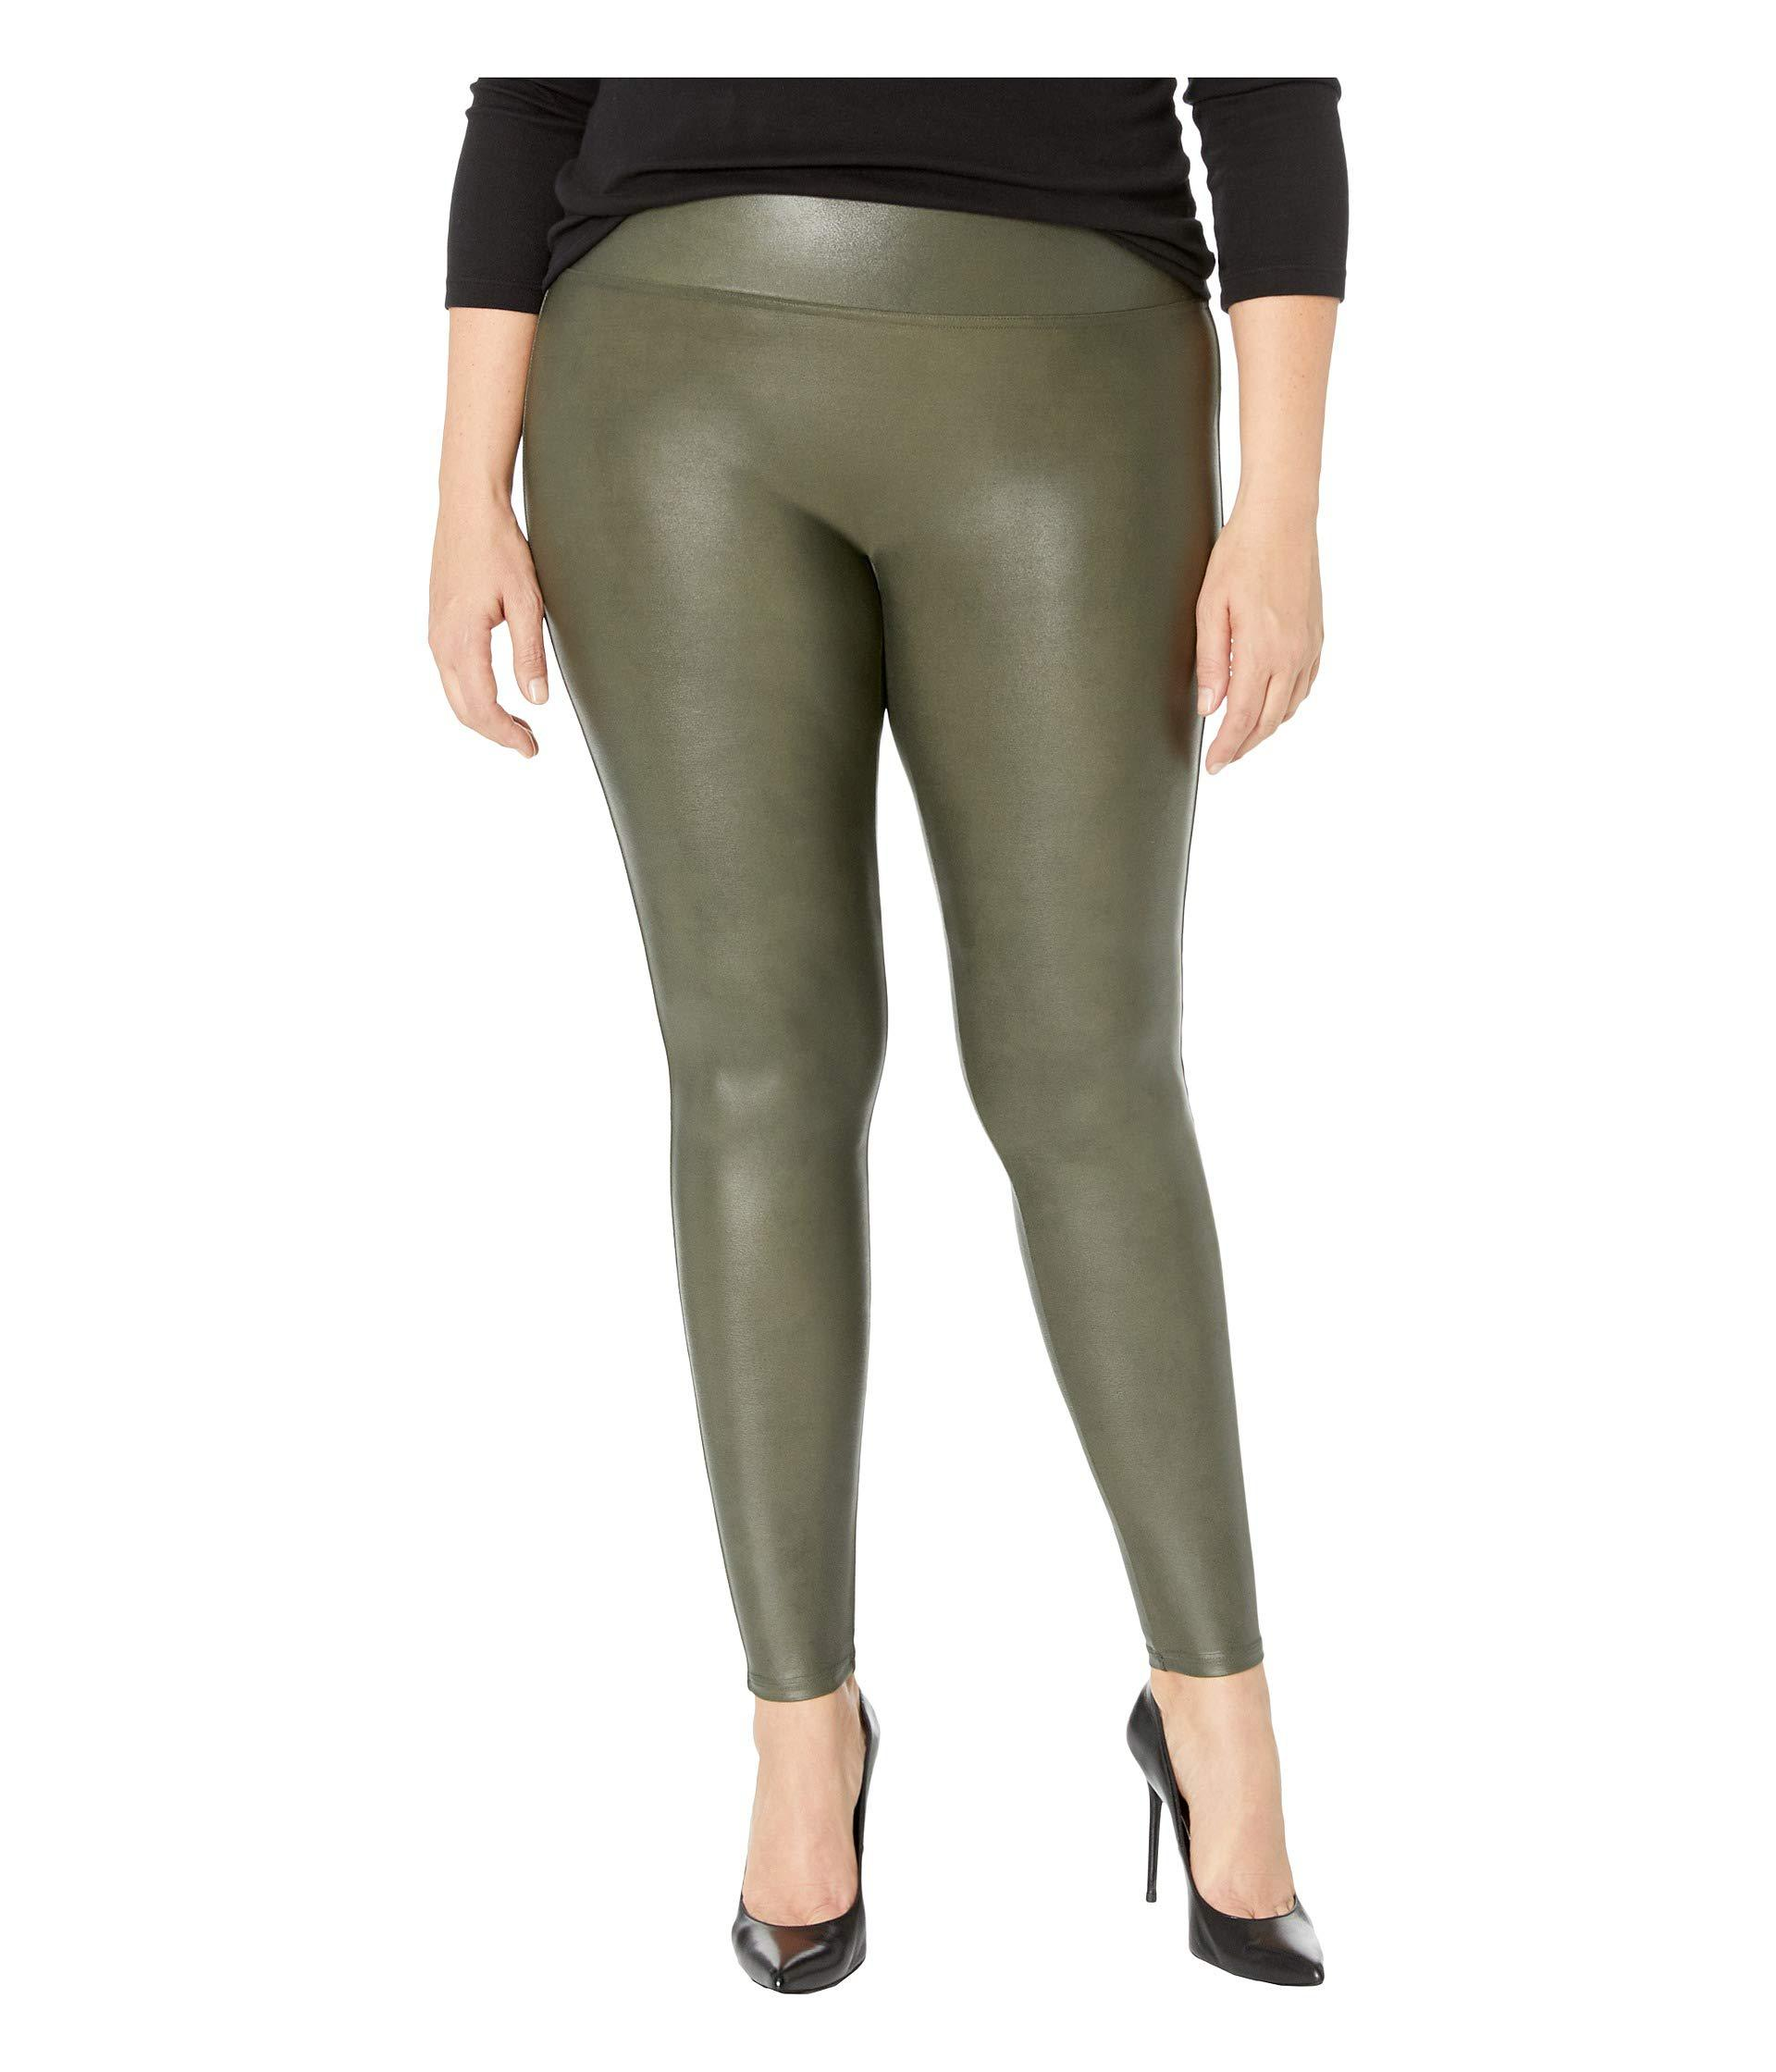 5a85c1ec7e2 Spanx. Green Plus Size Faux Leather Leggings (black) Women s Clothing